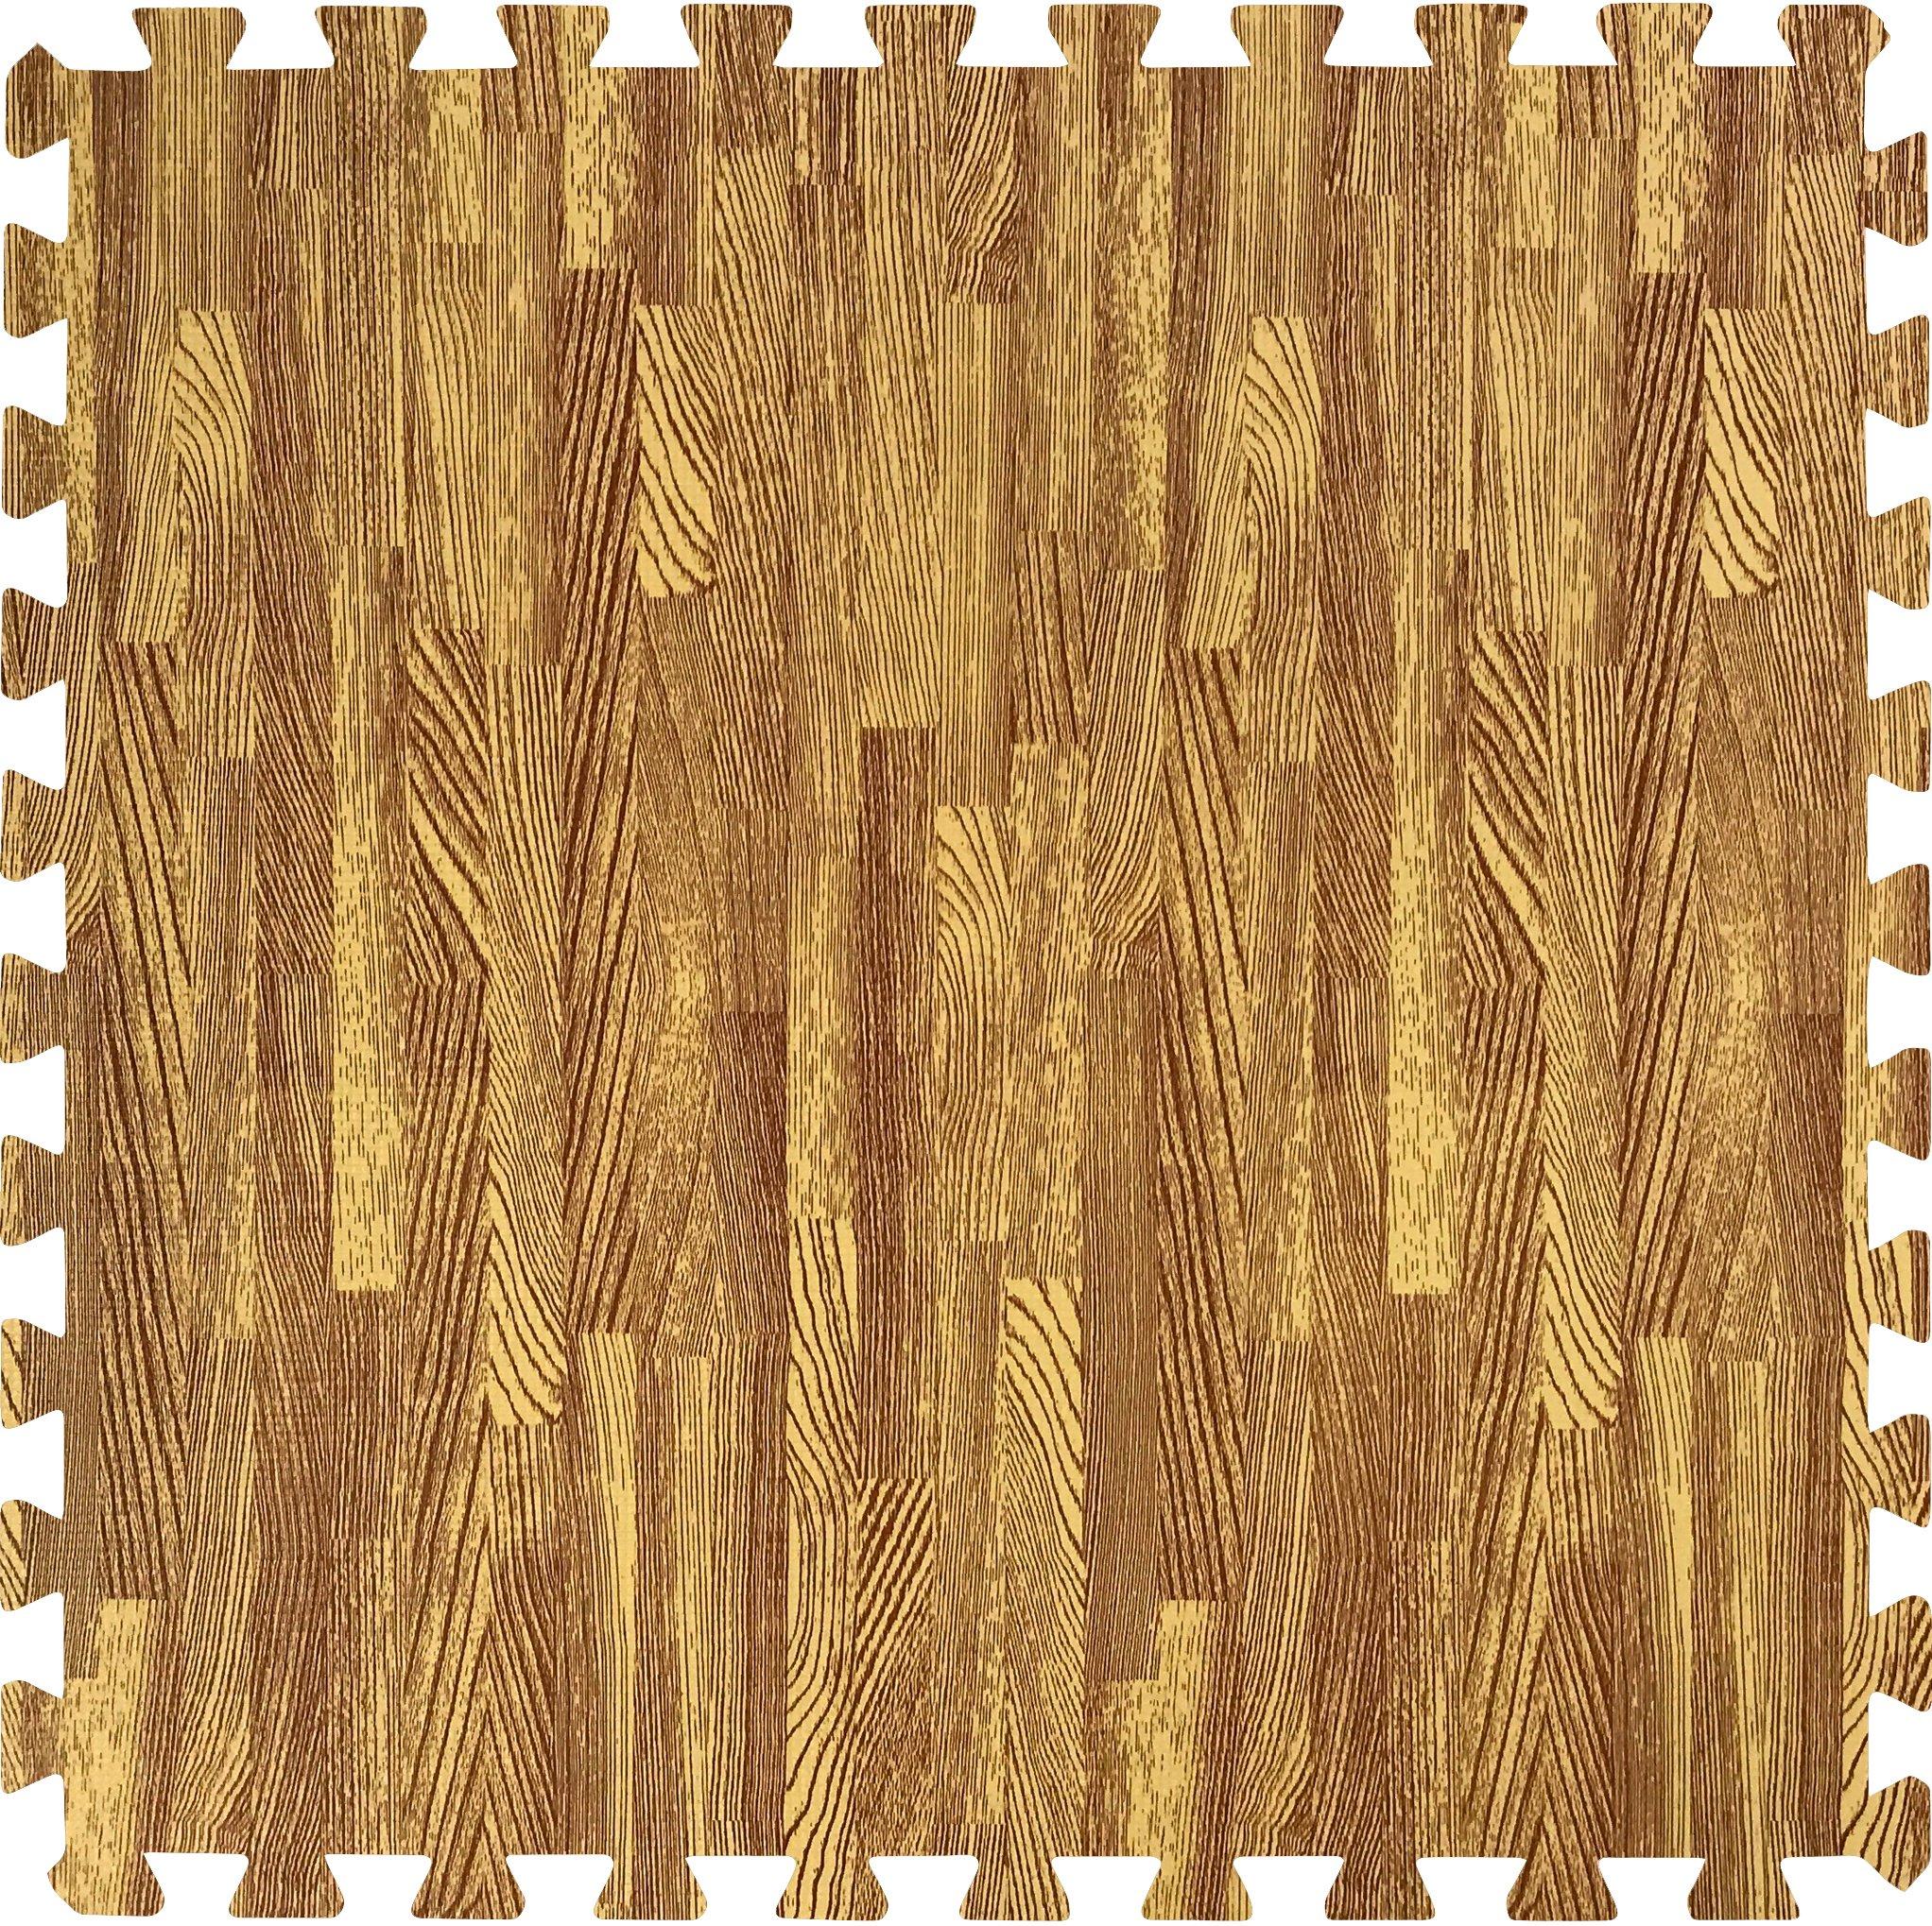 Sorbus Interlocking Floor Mat Print, Wood Grain - Light (6-Piece) by Sorbus (Image #2)